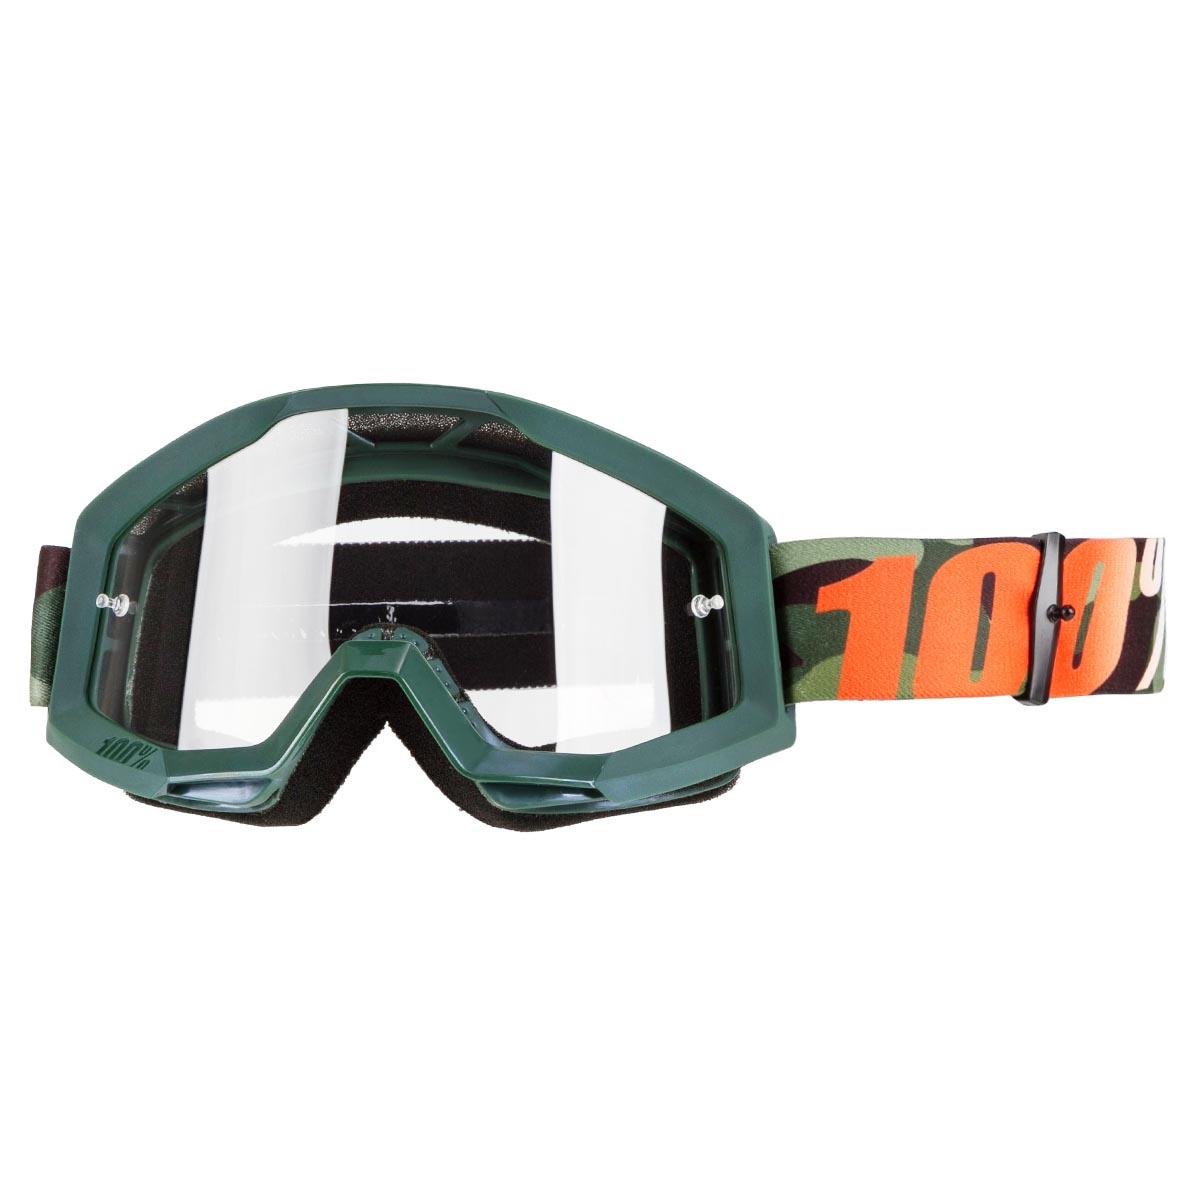 100% Crossbrille The Strata Huntsitan - Klar Anti-Fog